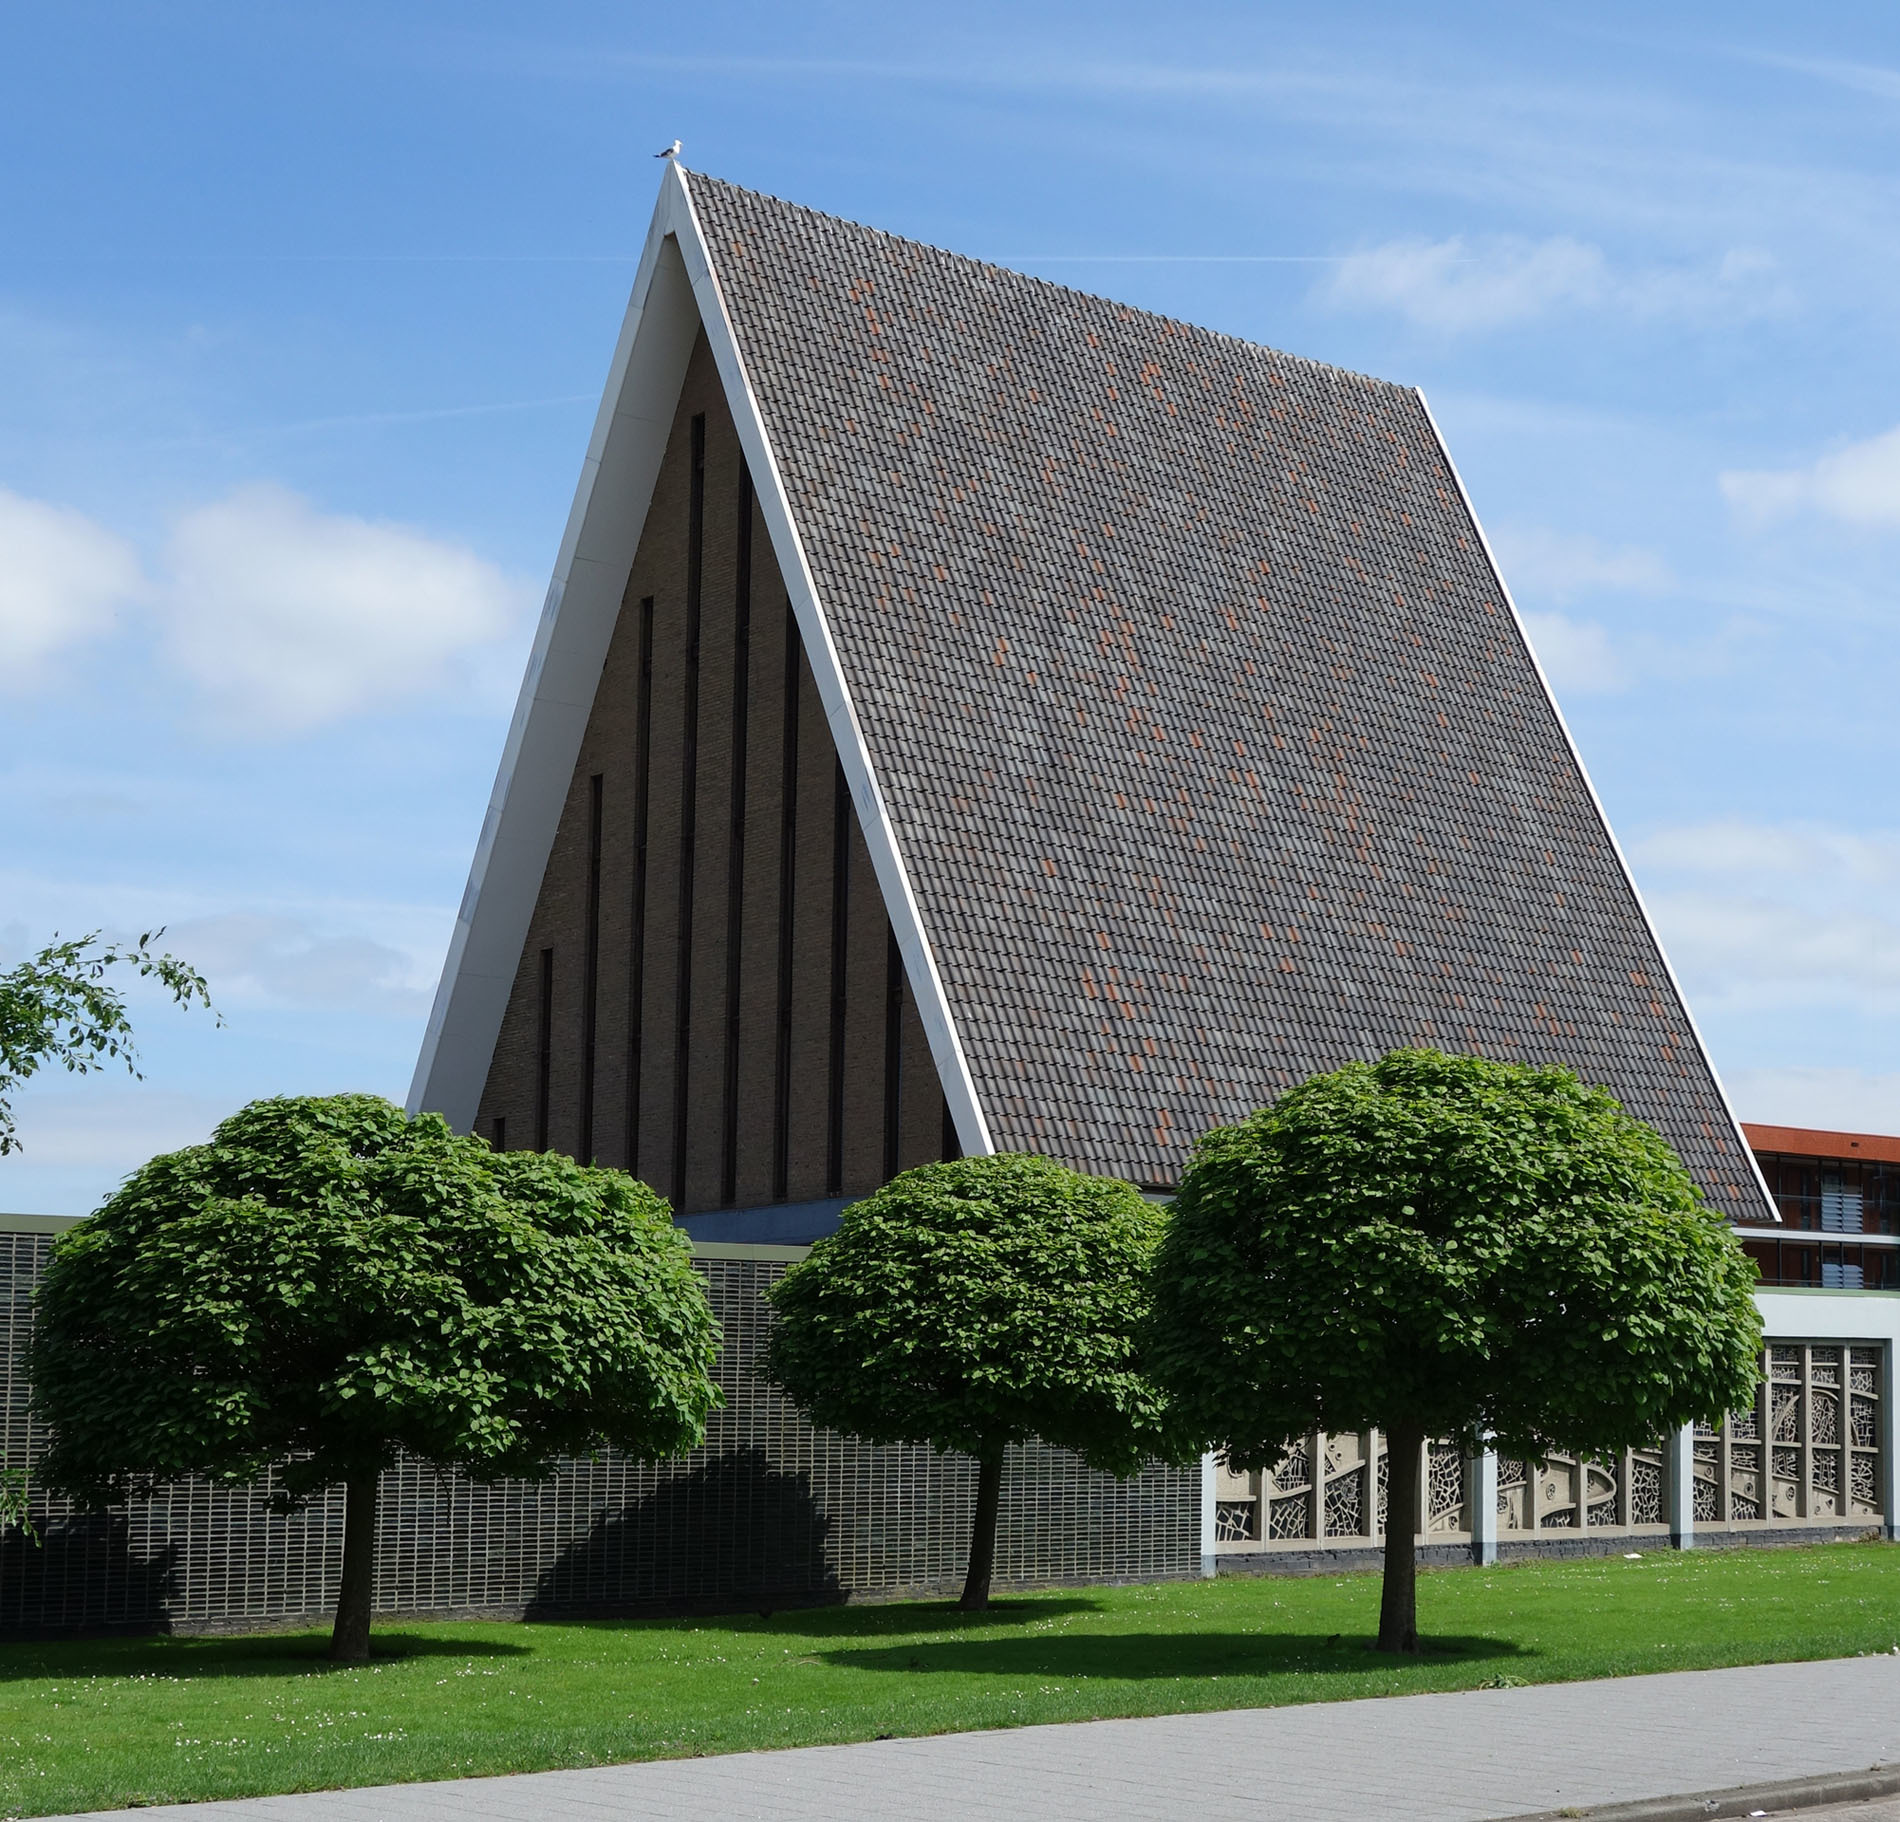 Alexanderkerk